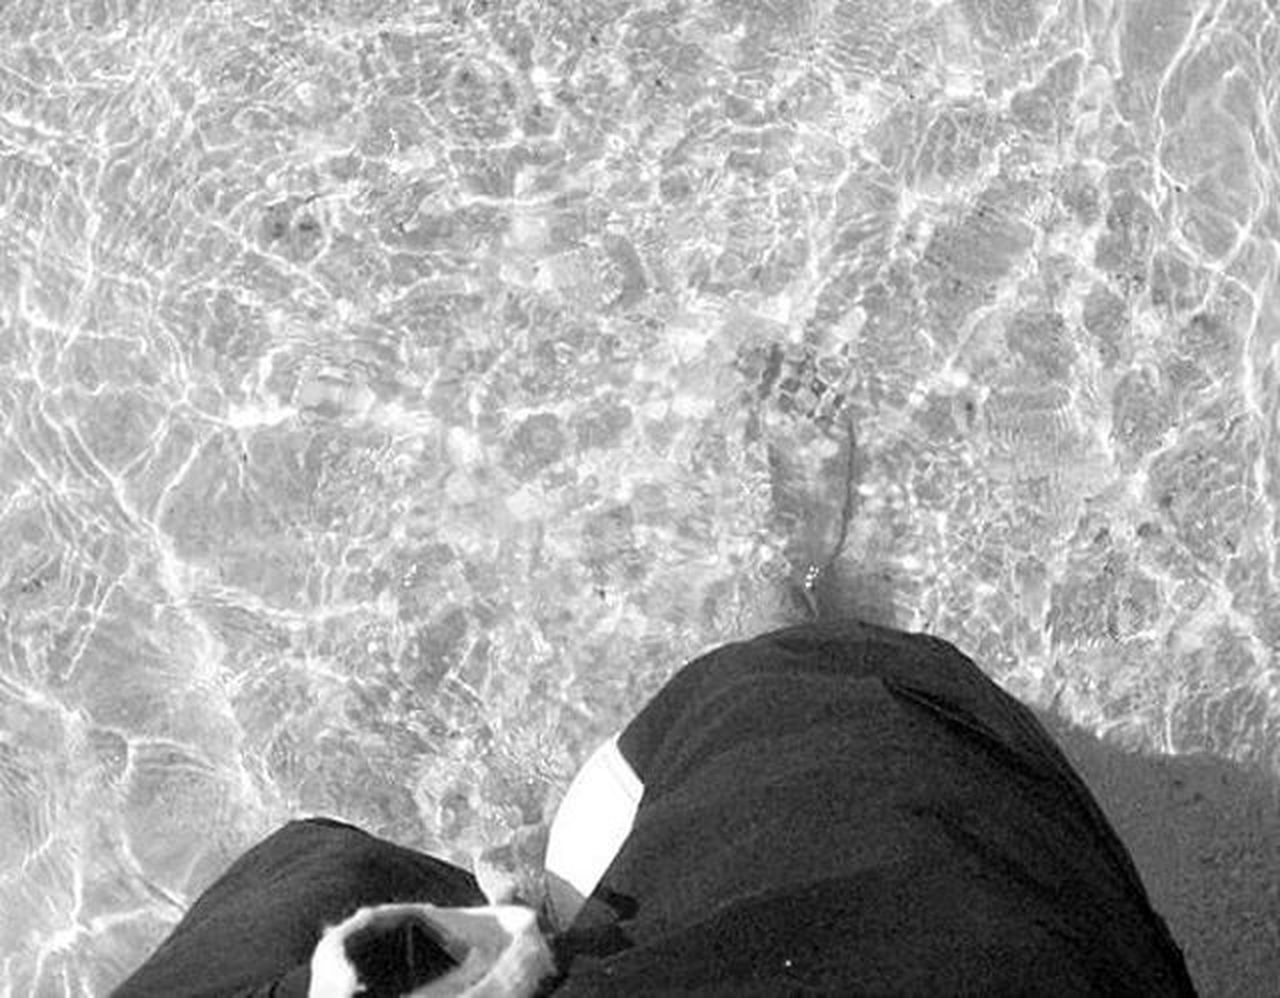 Monkeymia WesternAustralia Australia Mytravelgram Mytrip All_shots F4F Walking Beach Ocean Stepbystep Monochrome Blackandwhite Igersitalia Bw_crew Bw_society Bw_lover Bw_awards Sand Me